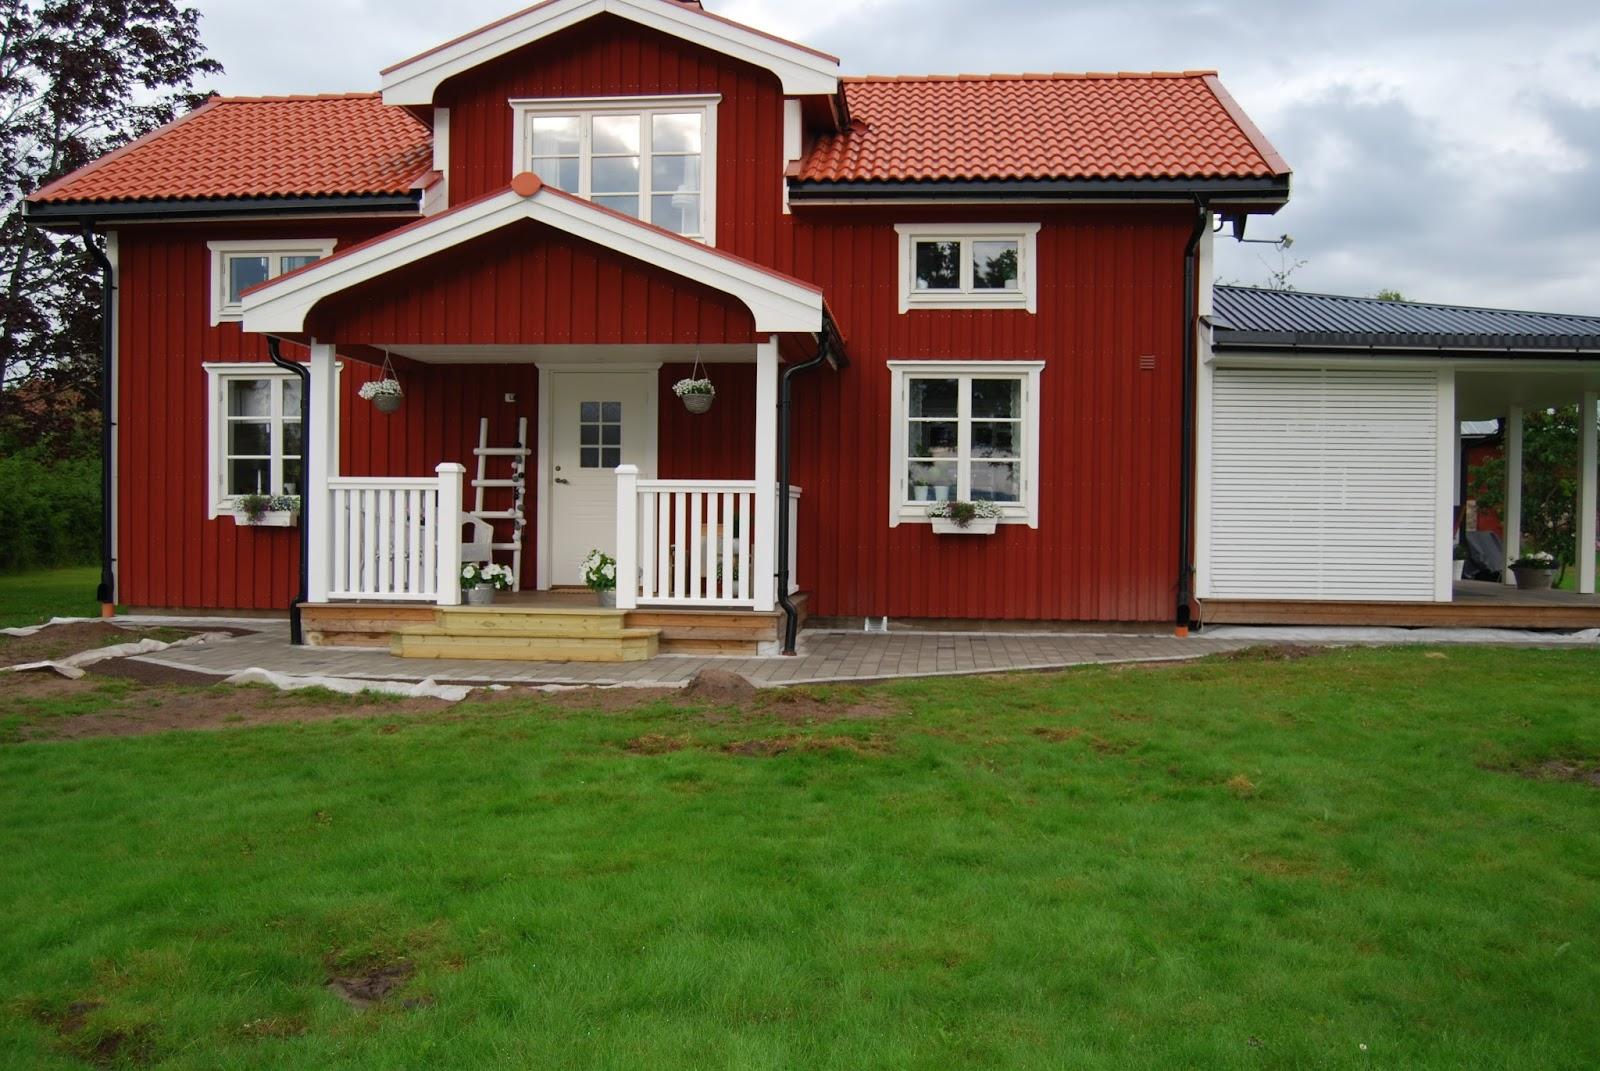 Trapp till veranda: images about swedish veranda on. family ...